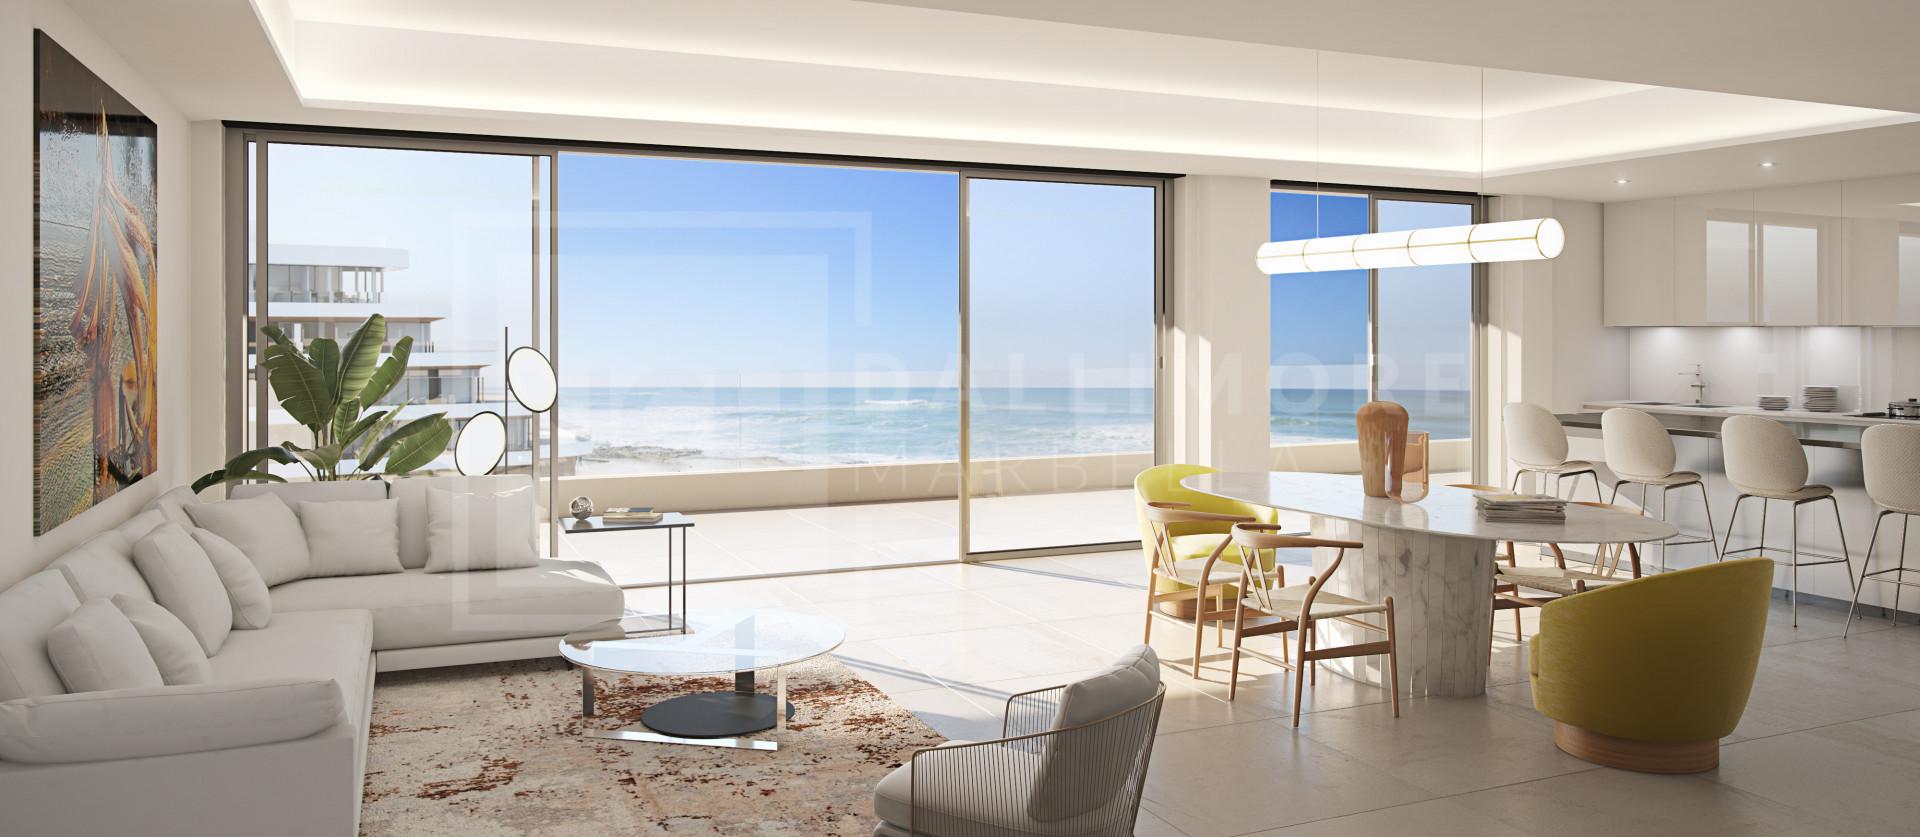 Penthouse Playamar, Torremolinos – NEWPH6205